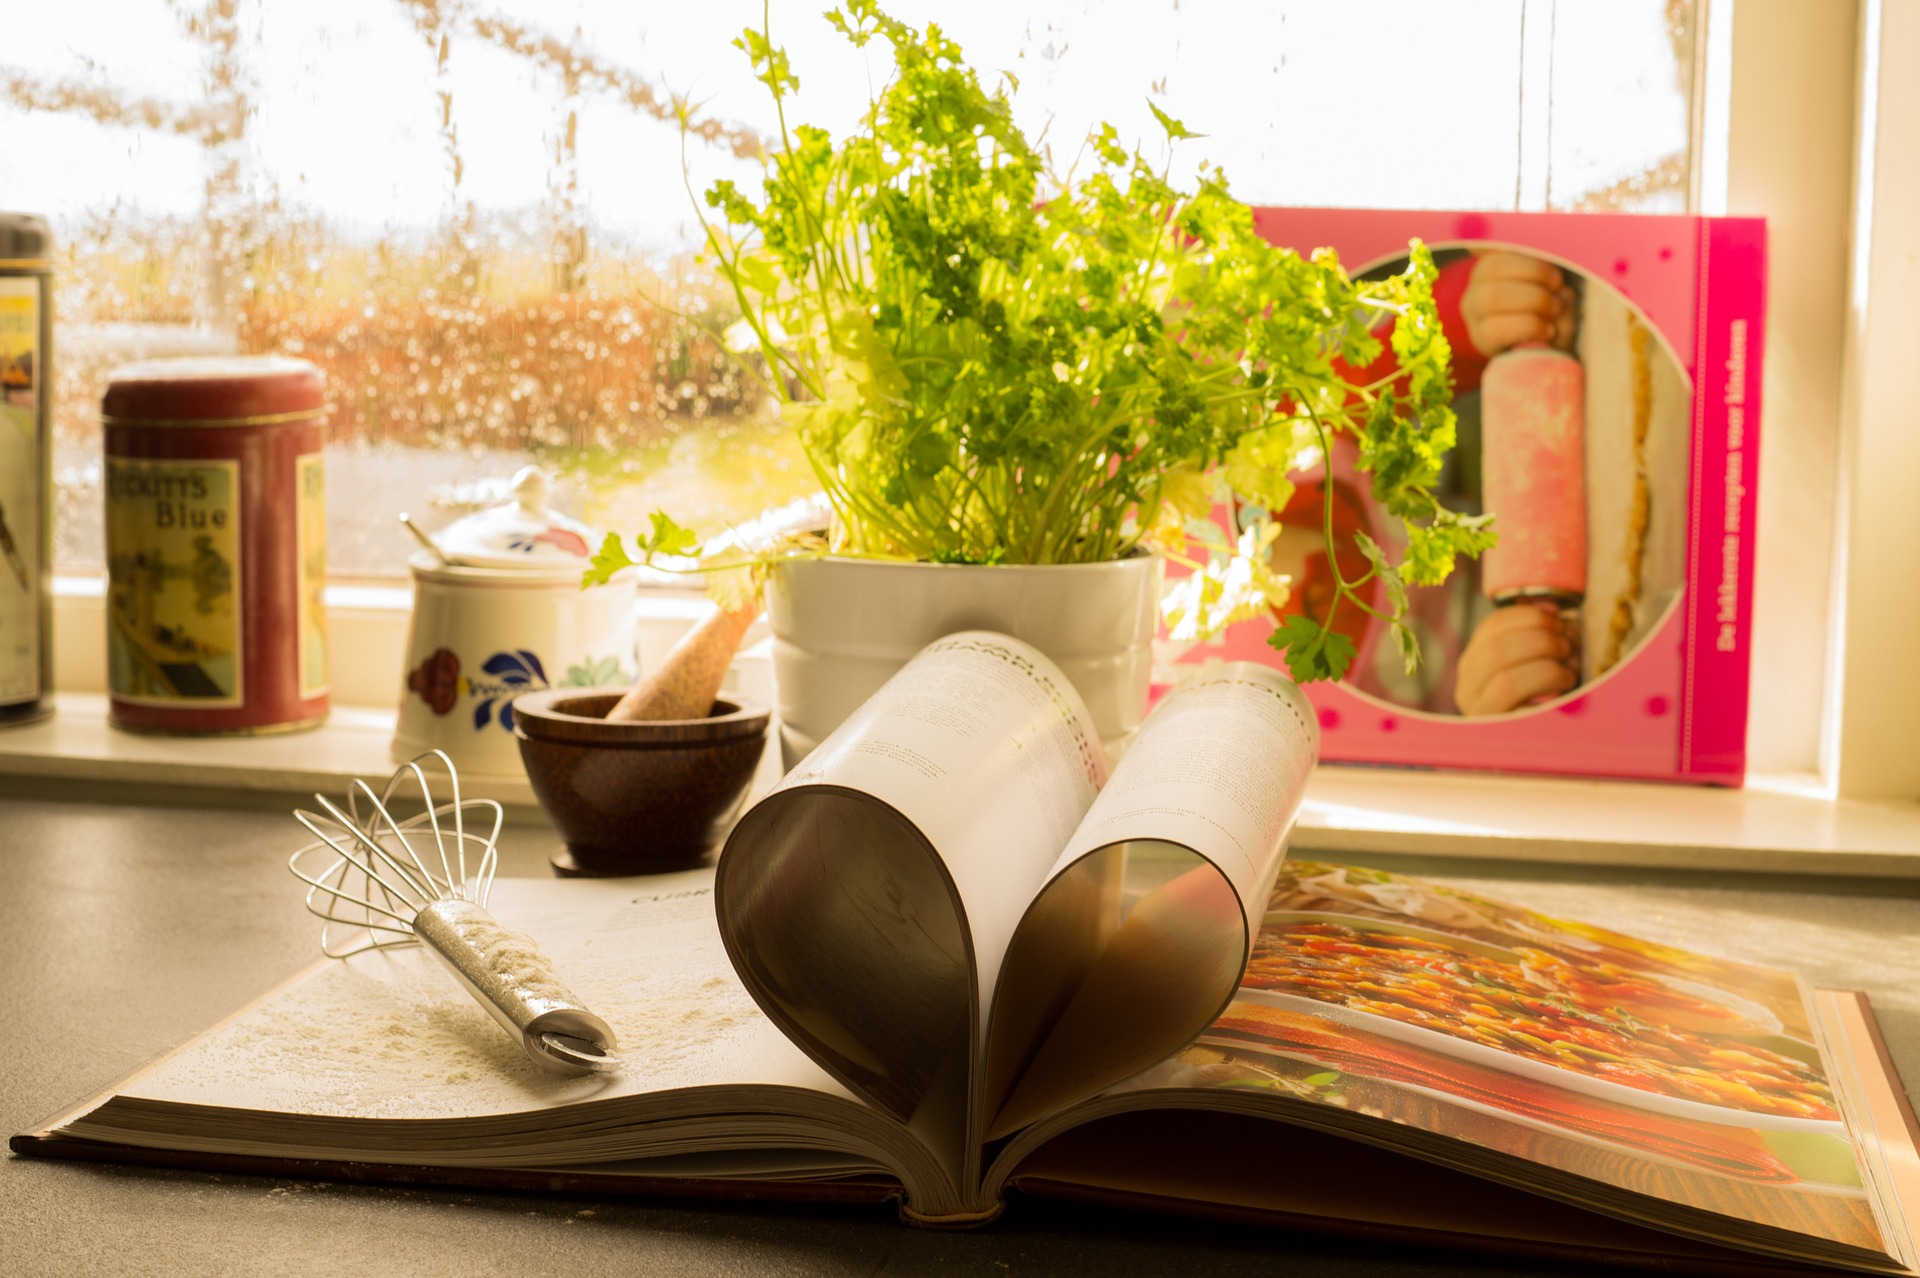 Cookbooks - Appliance City